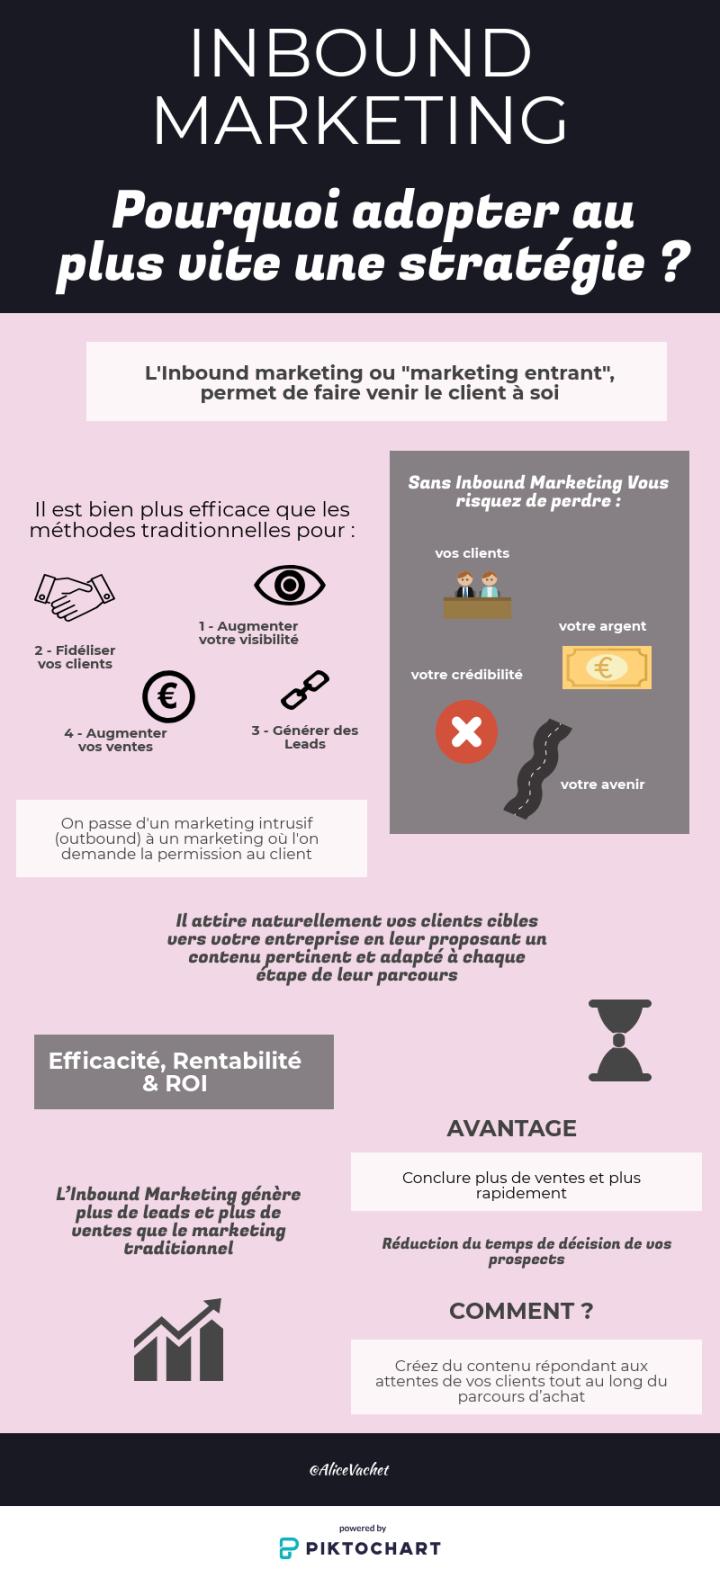 [Infographie] Pourquoi adopter au plus vite une stratégie Inbound Marketing?